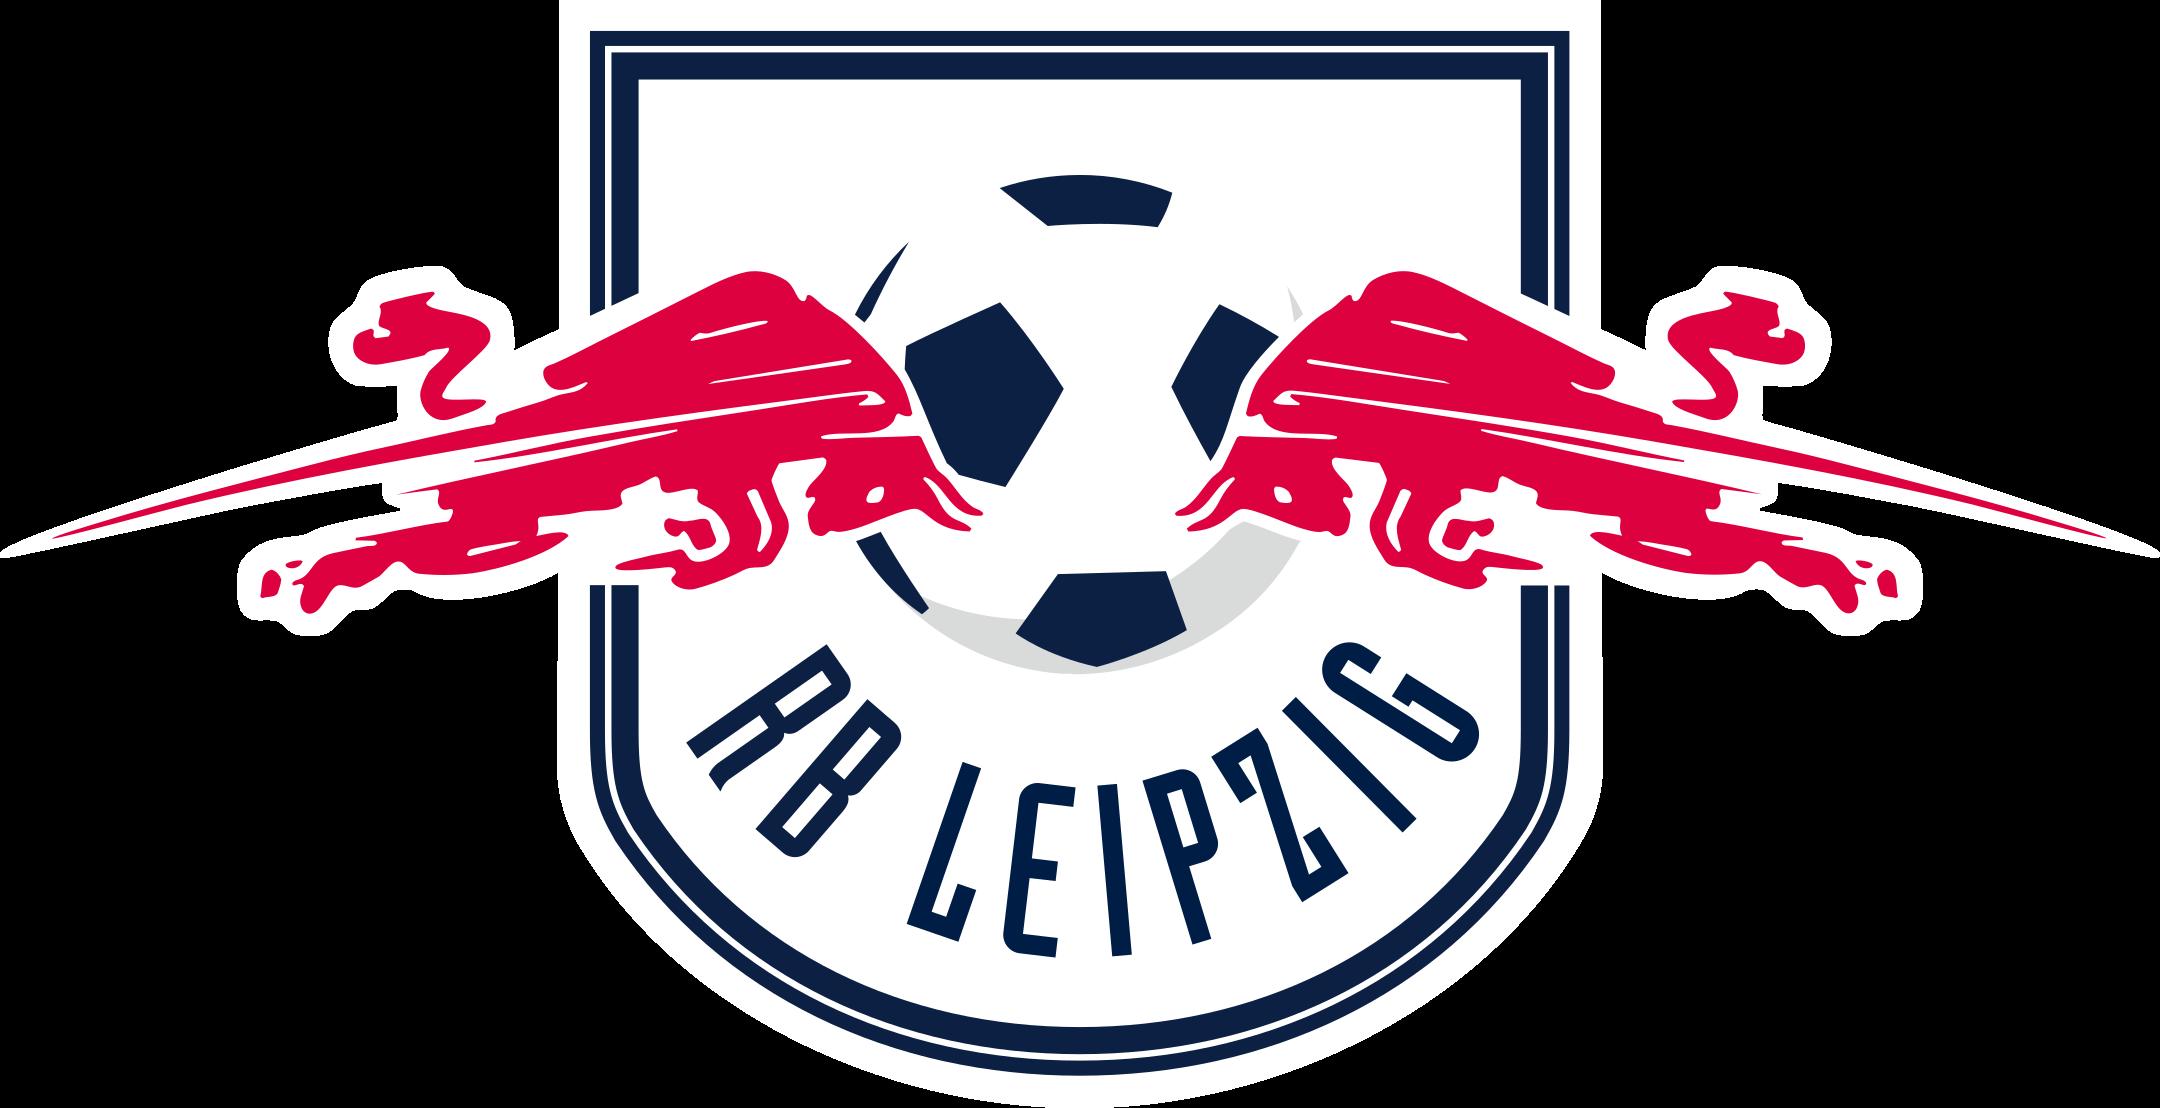 rb leipzig logo 1 - RB Leipzig Logo